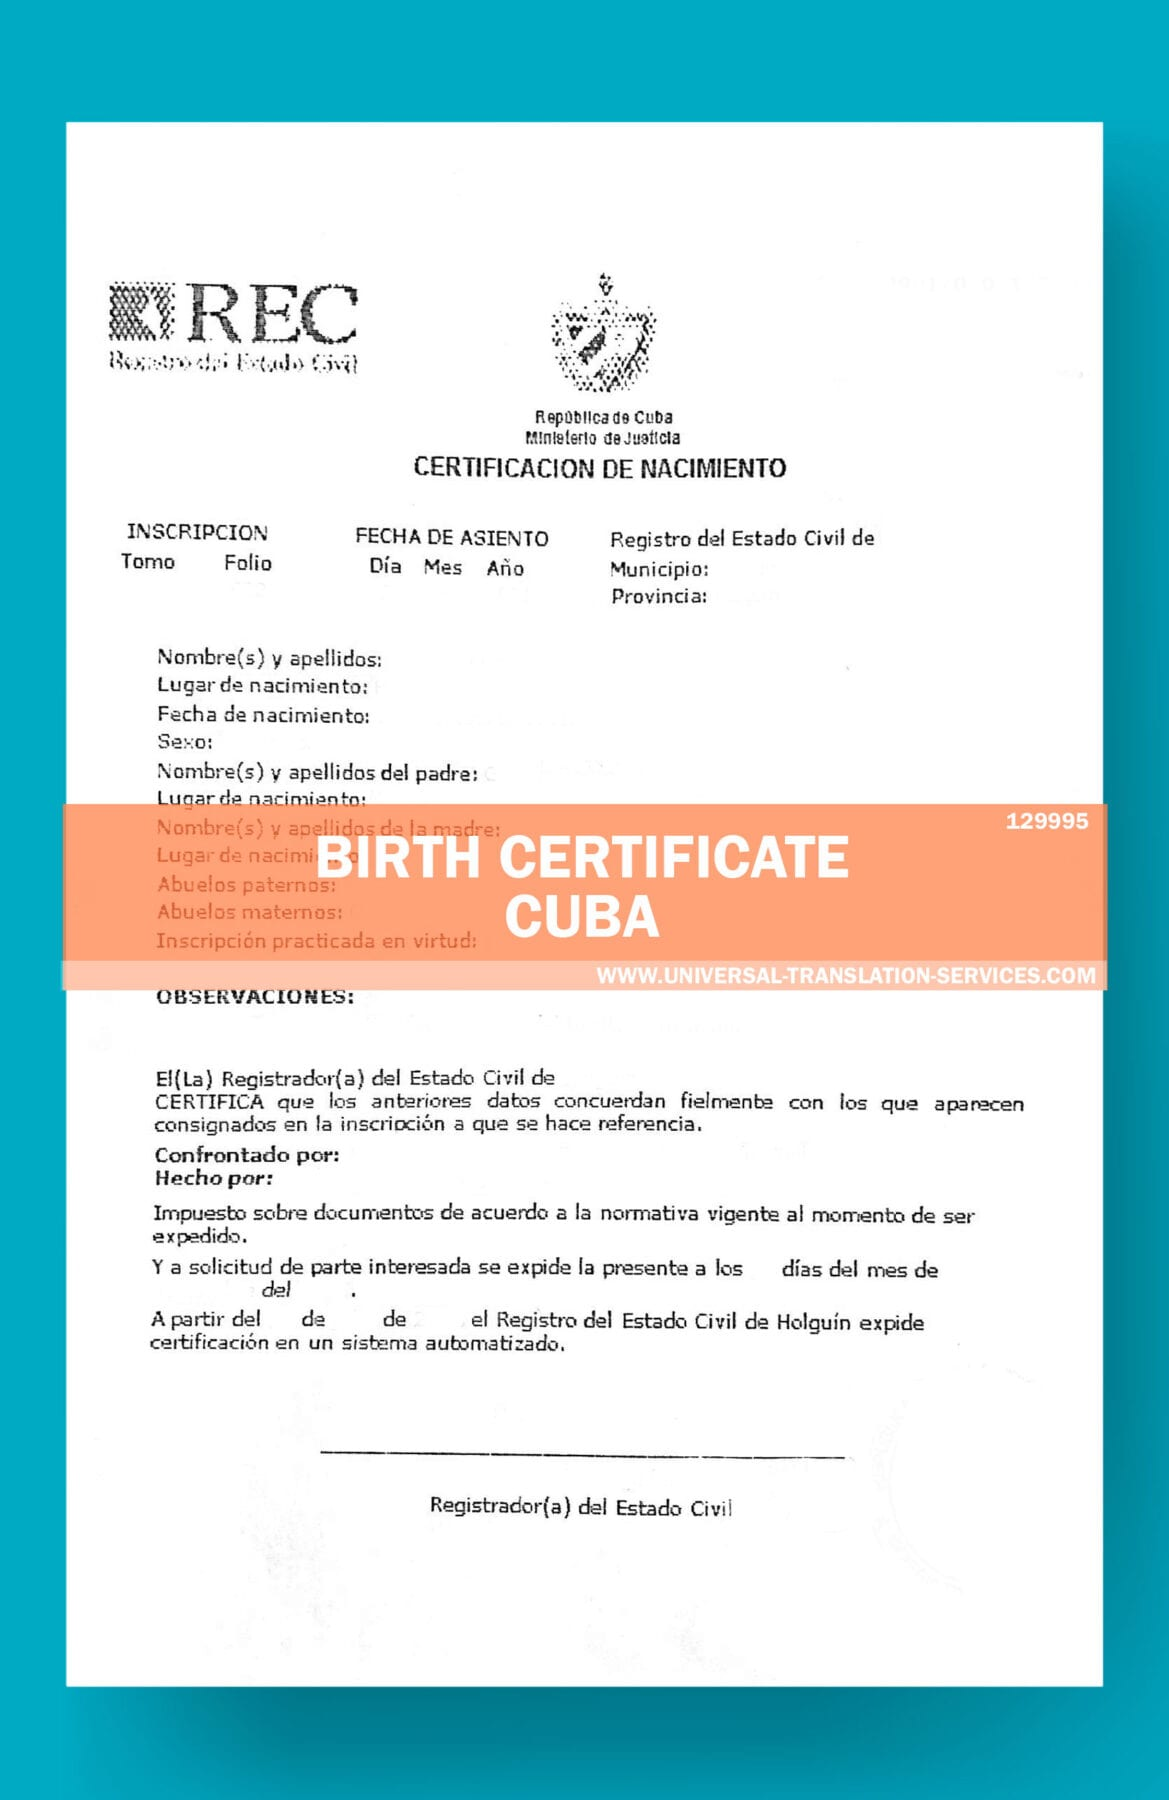 Spanish Birth Certificate Translation Template For Cuba 15